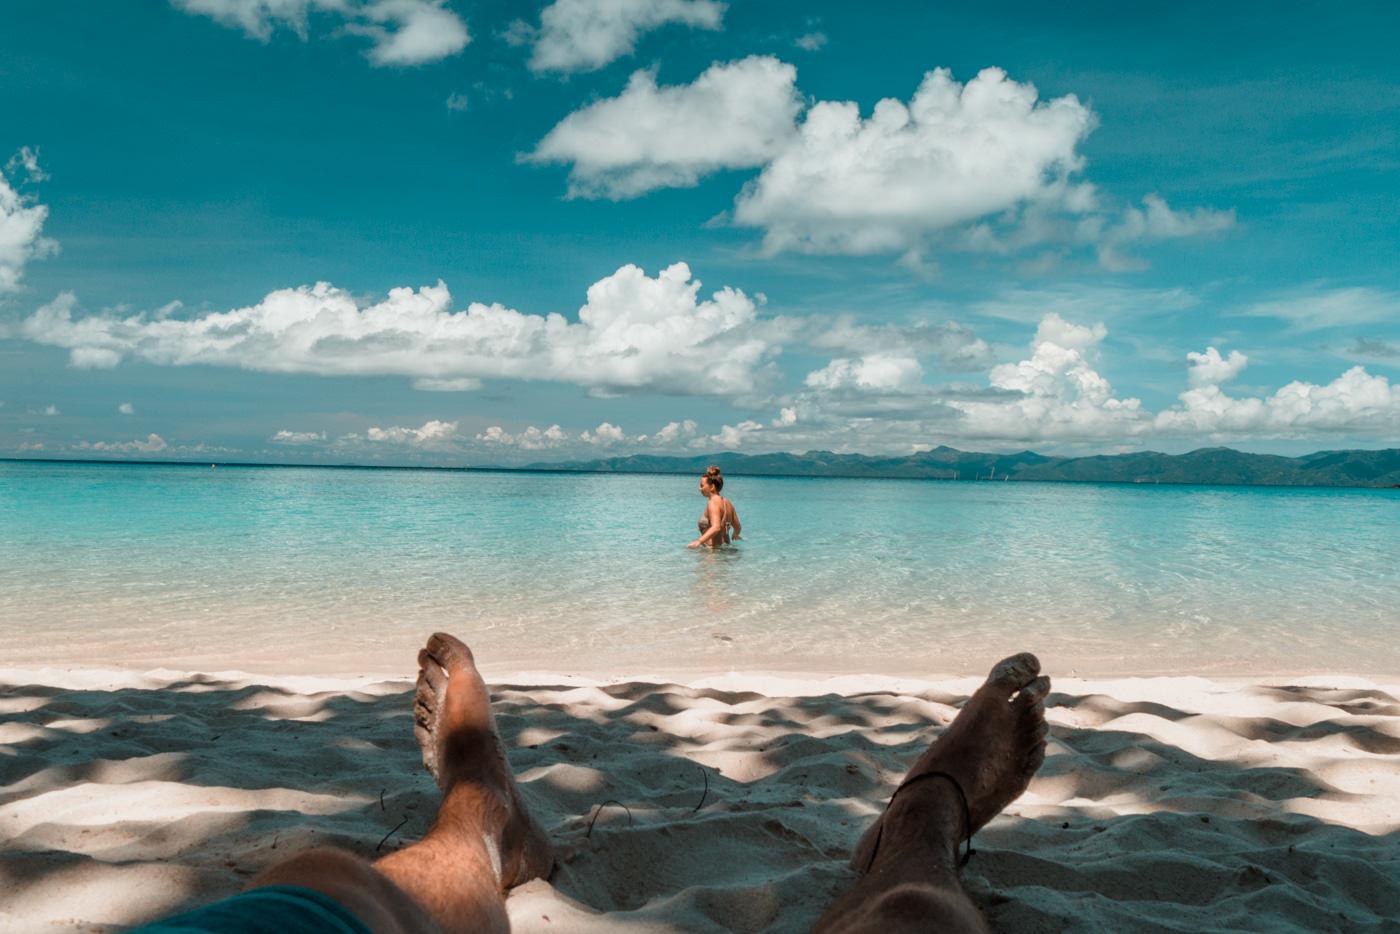 Wir am Tiamban Beach auf Romblon Island